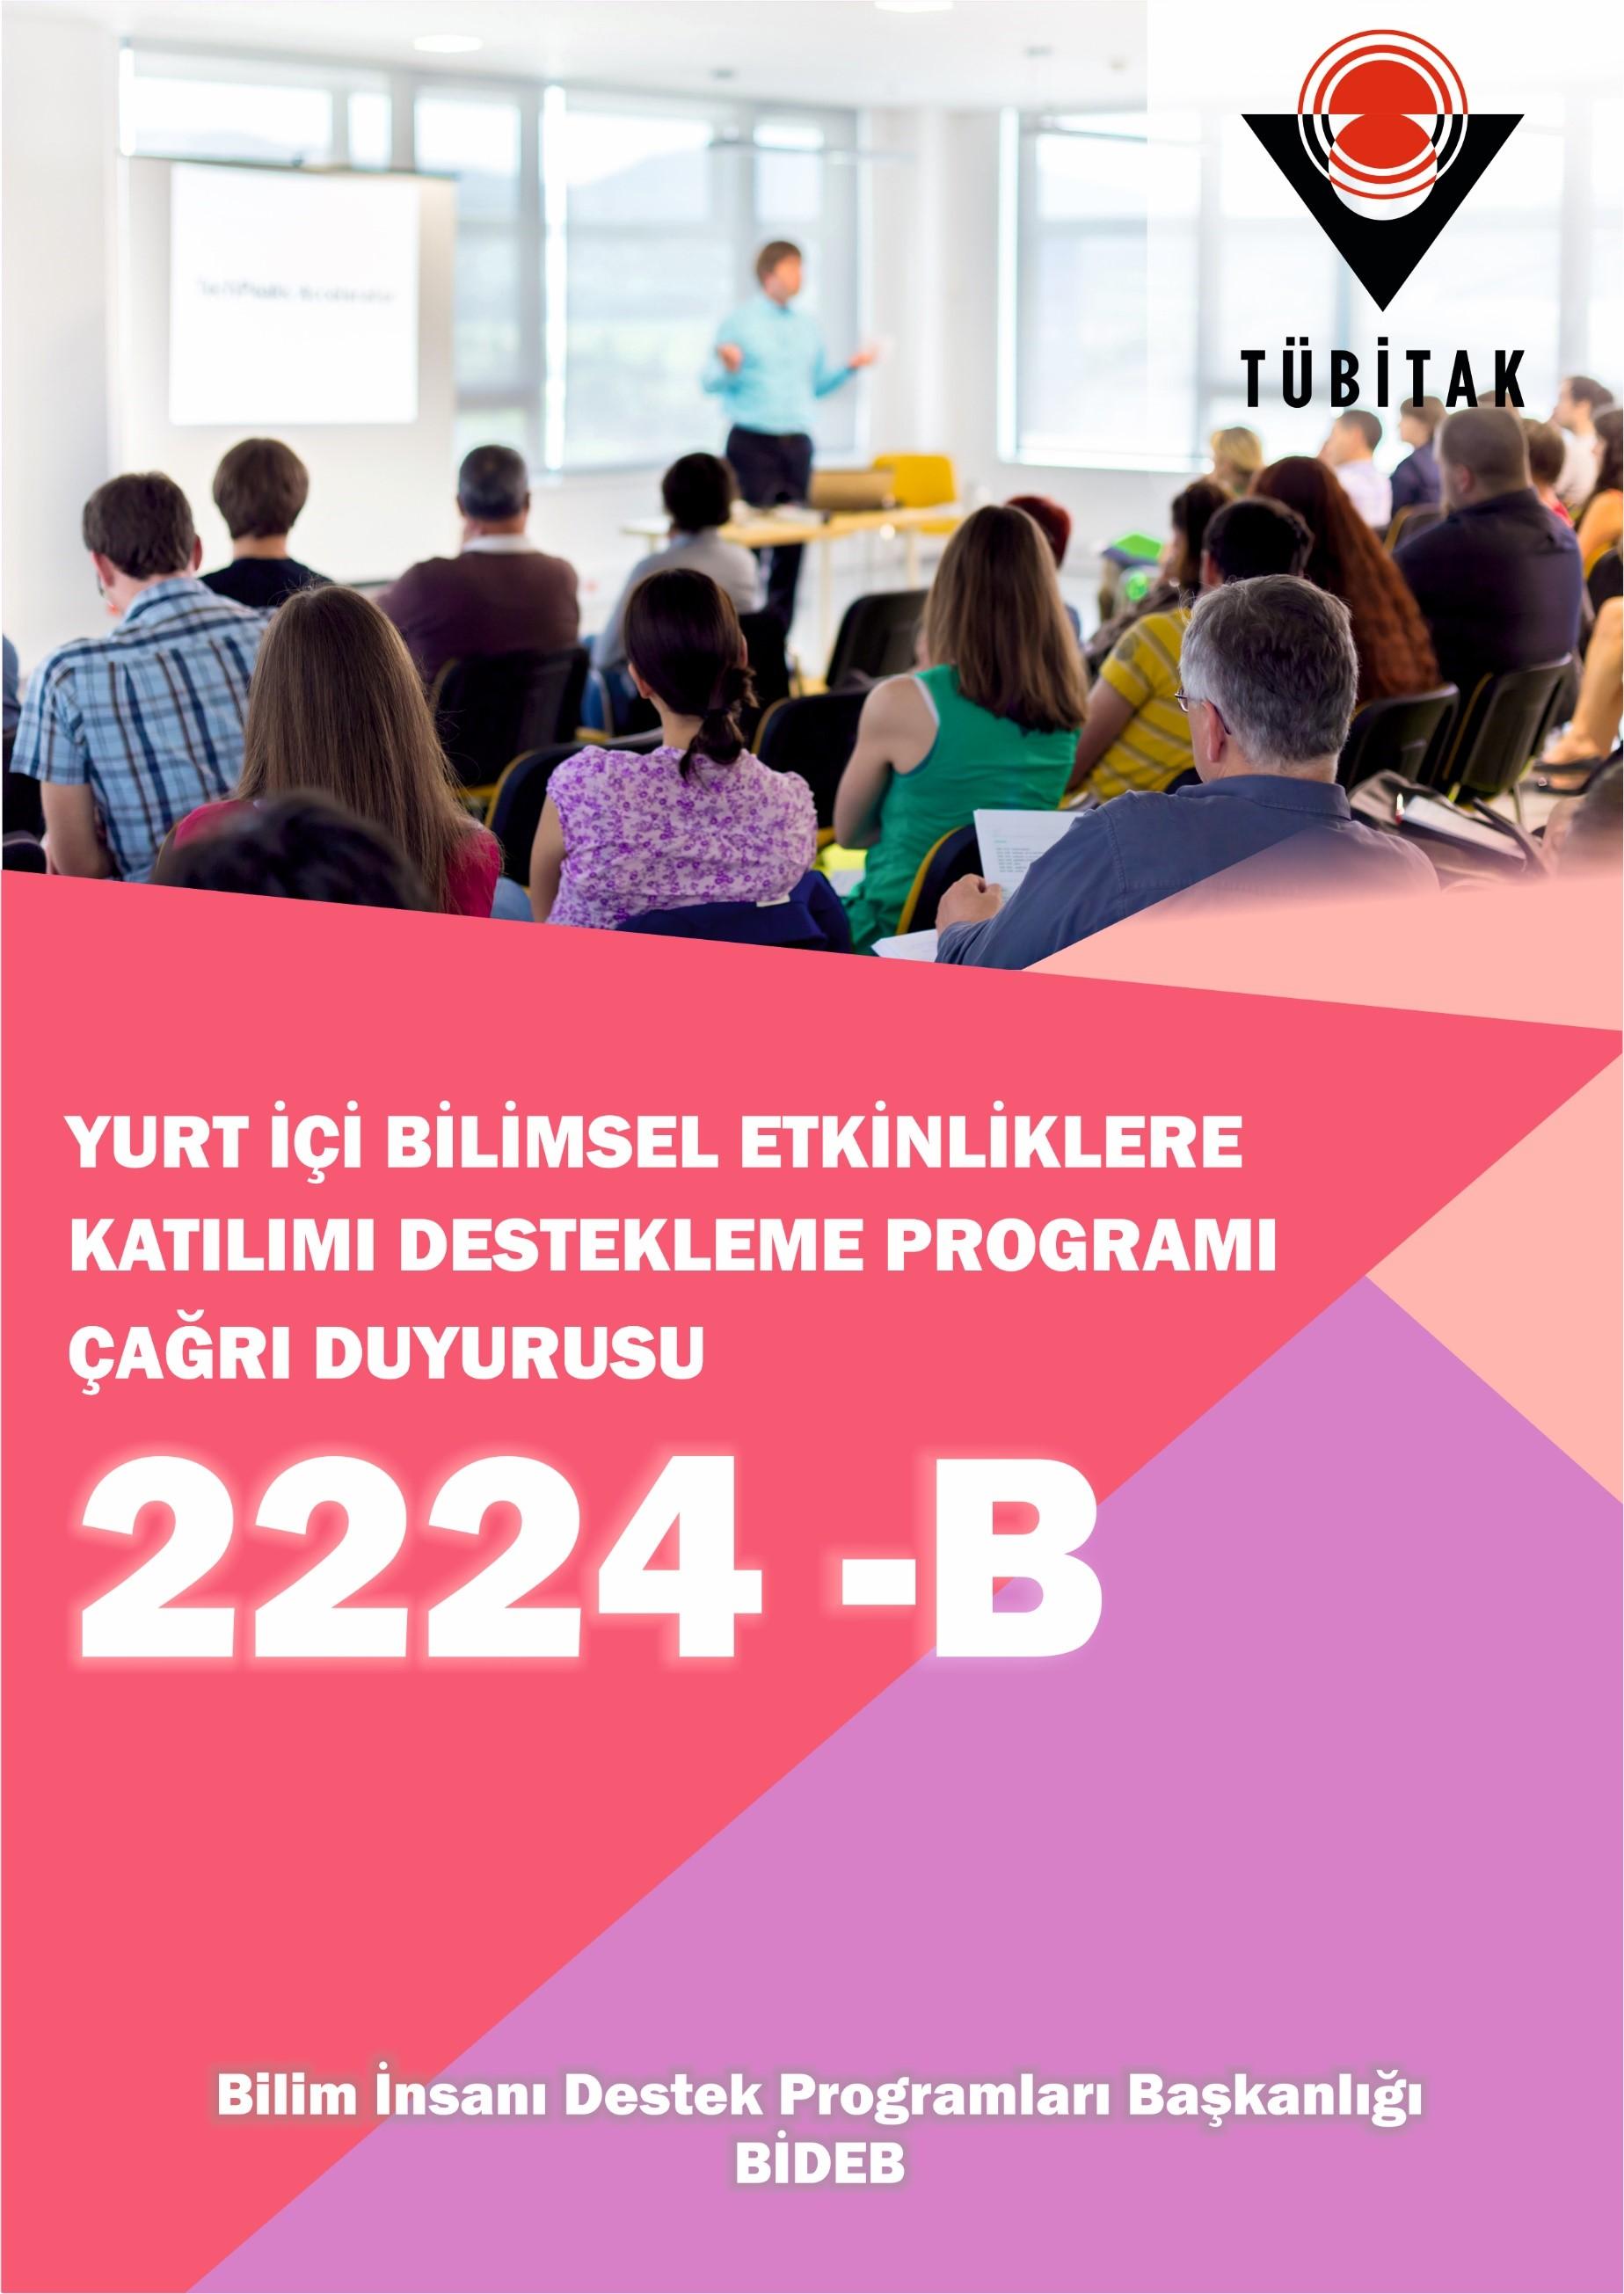 2224-B